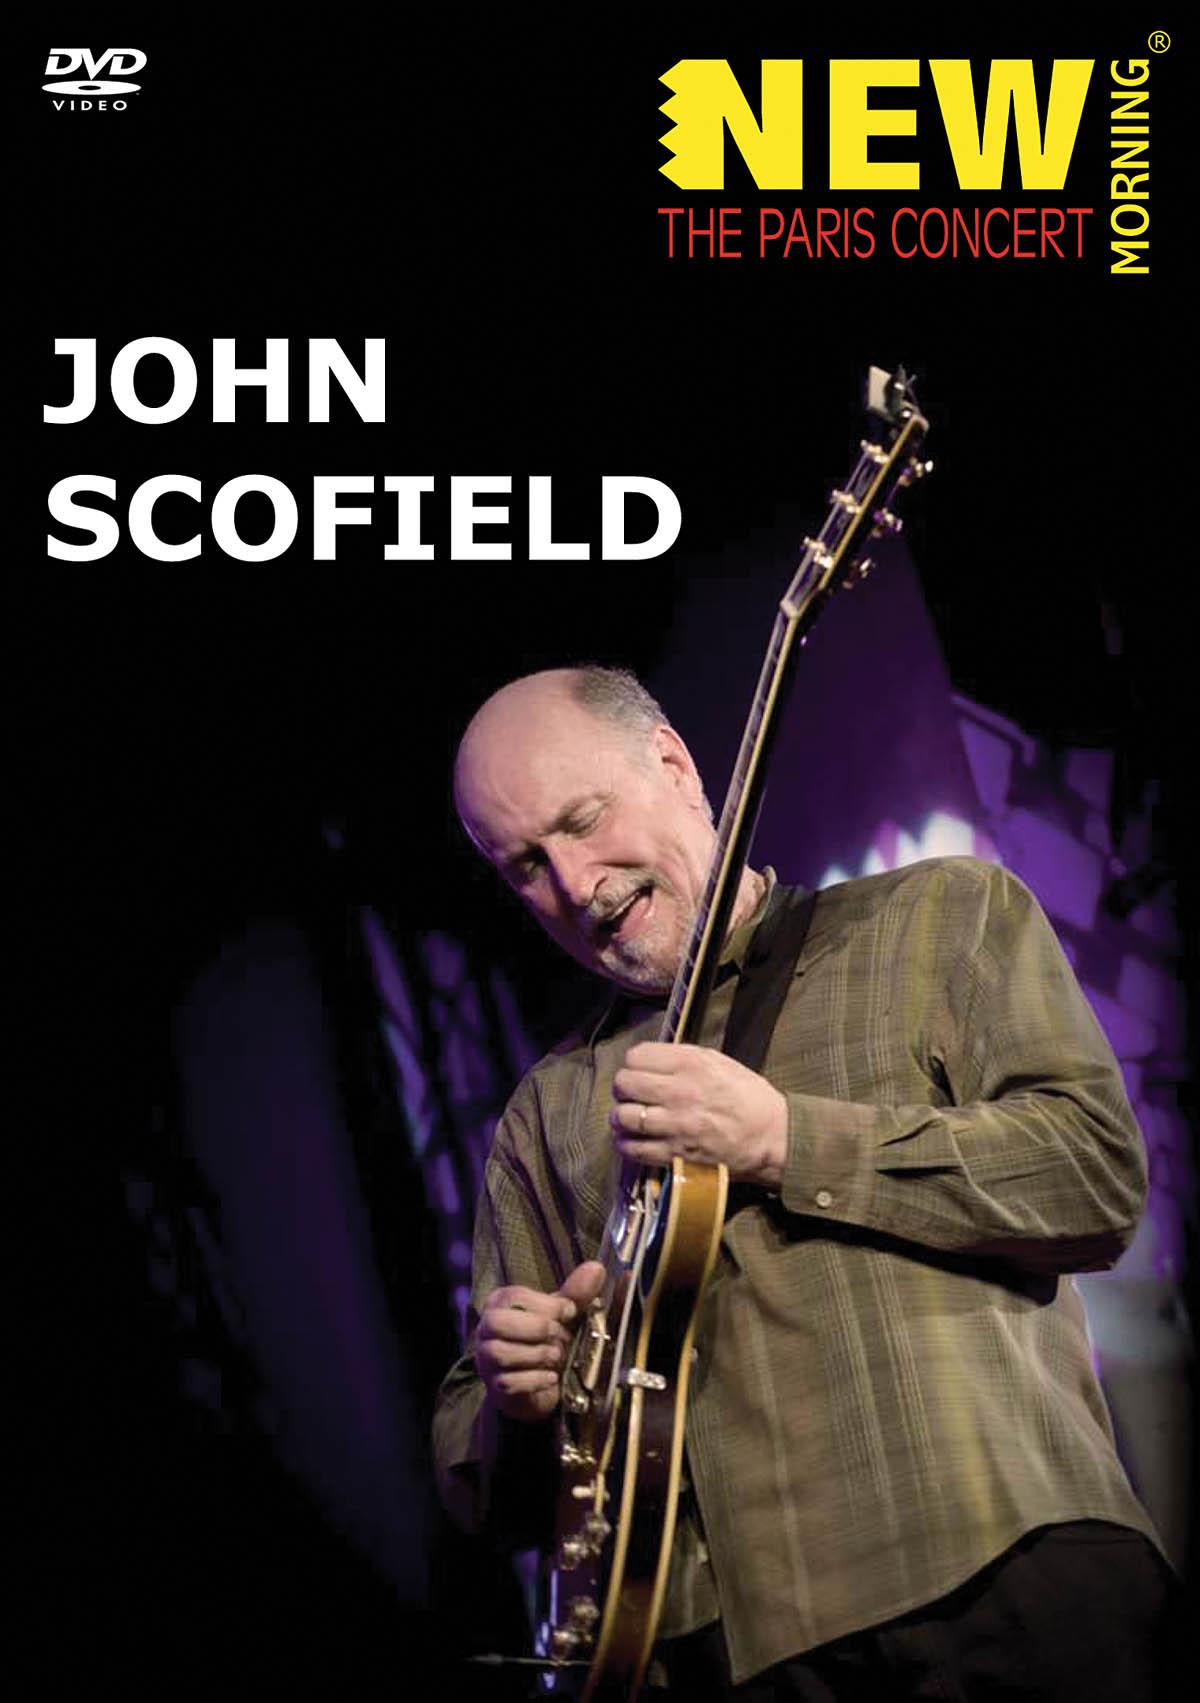 John Scofield: The Paris Concert: Recorded Performance